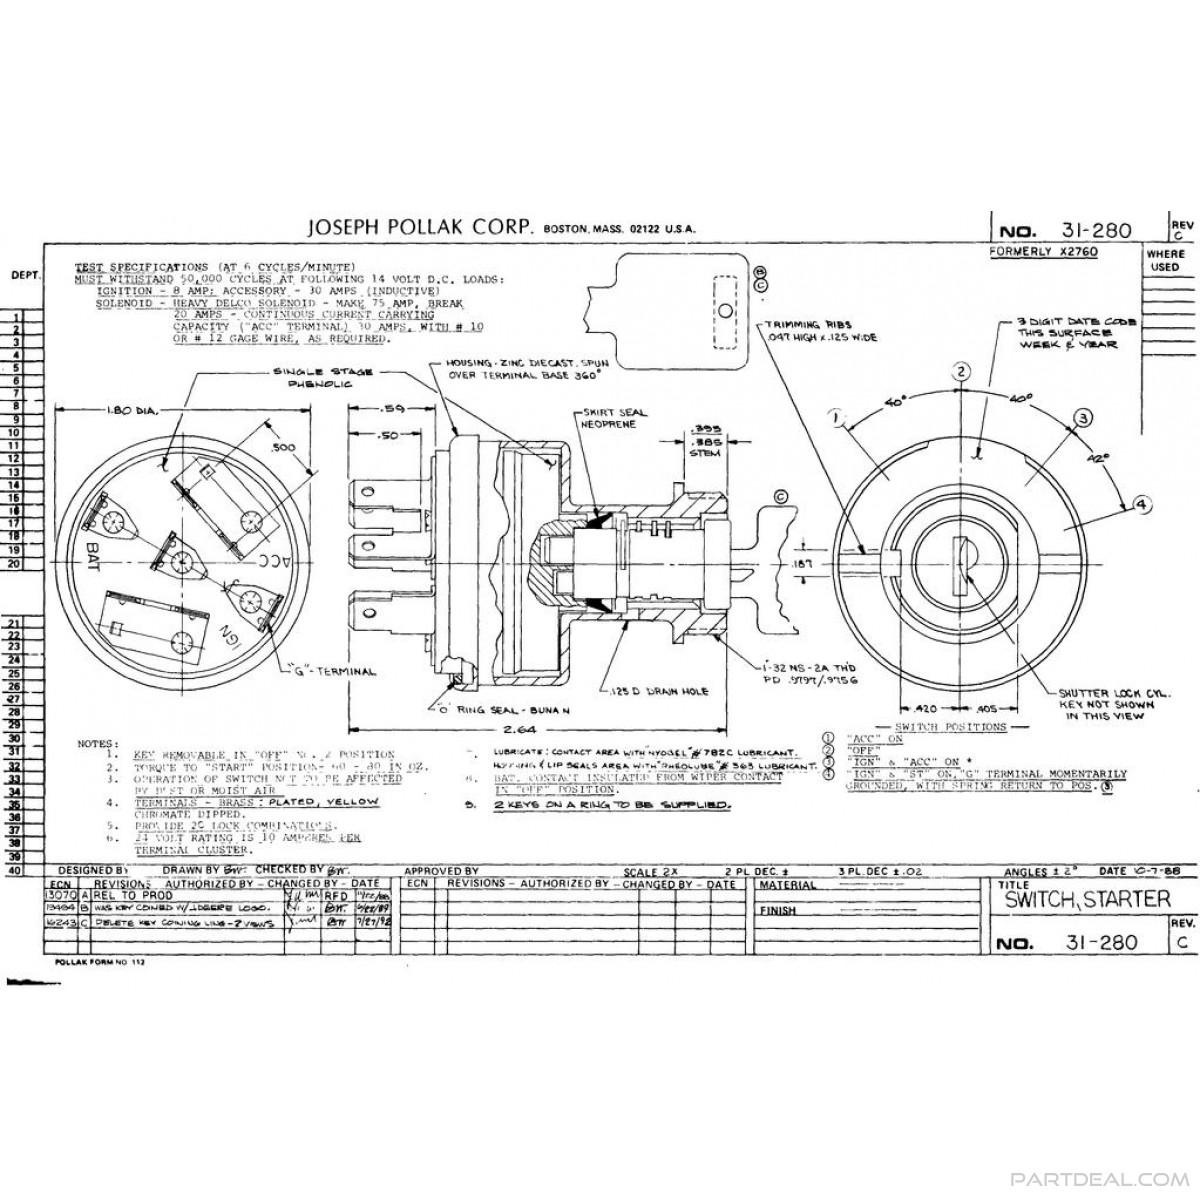 pollak marine ignition switch wiring diagram - wiring diagram please-note-b  - please-note-b.agriturismoduemadonne.it  agriturismoduemadonne.it